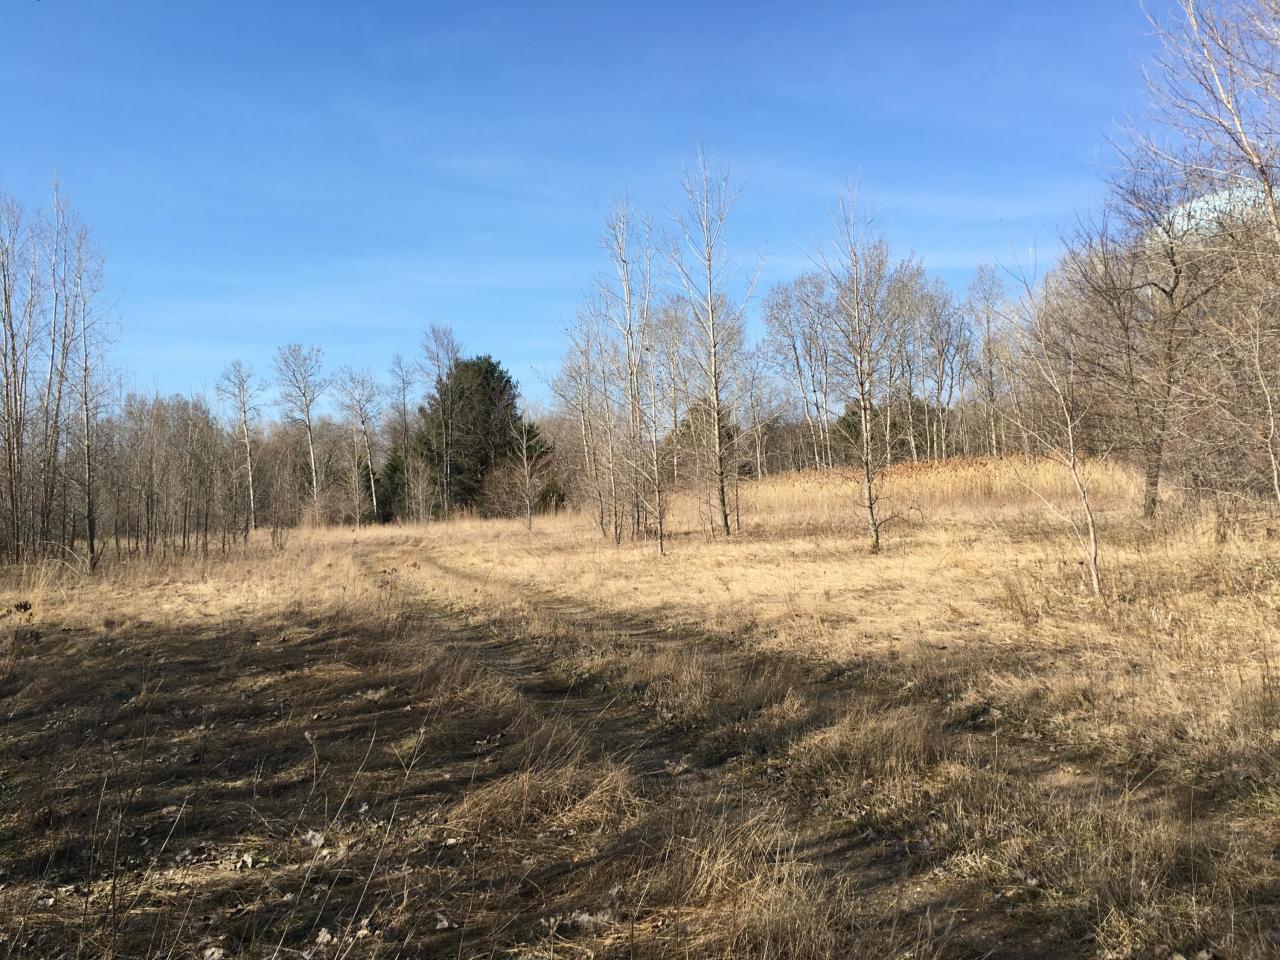 TBD Edwin ST, Marinette, Wisconsin 54143, ,Vacant Land,For Sale,Edwin ST,1690383